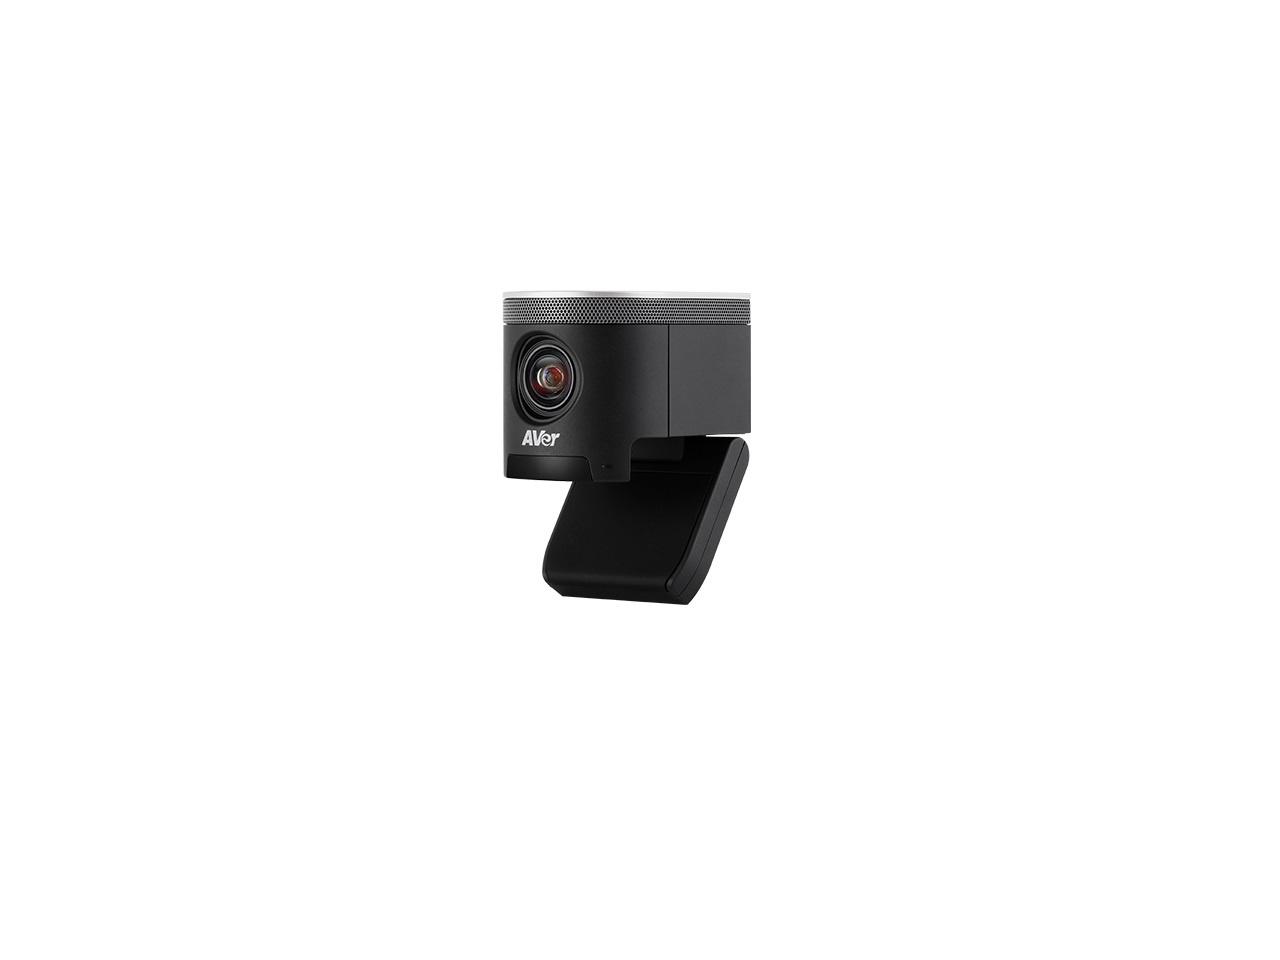 Aver hordozható konferenci kamera, cam3403